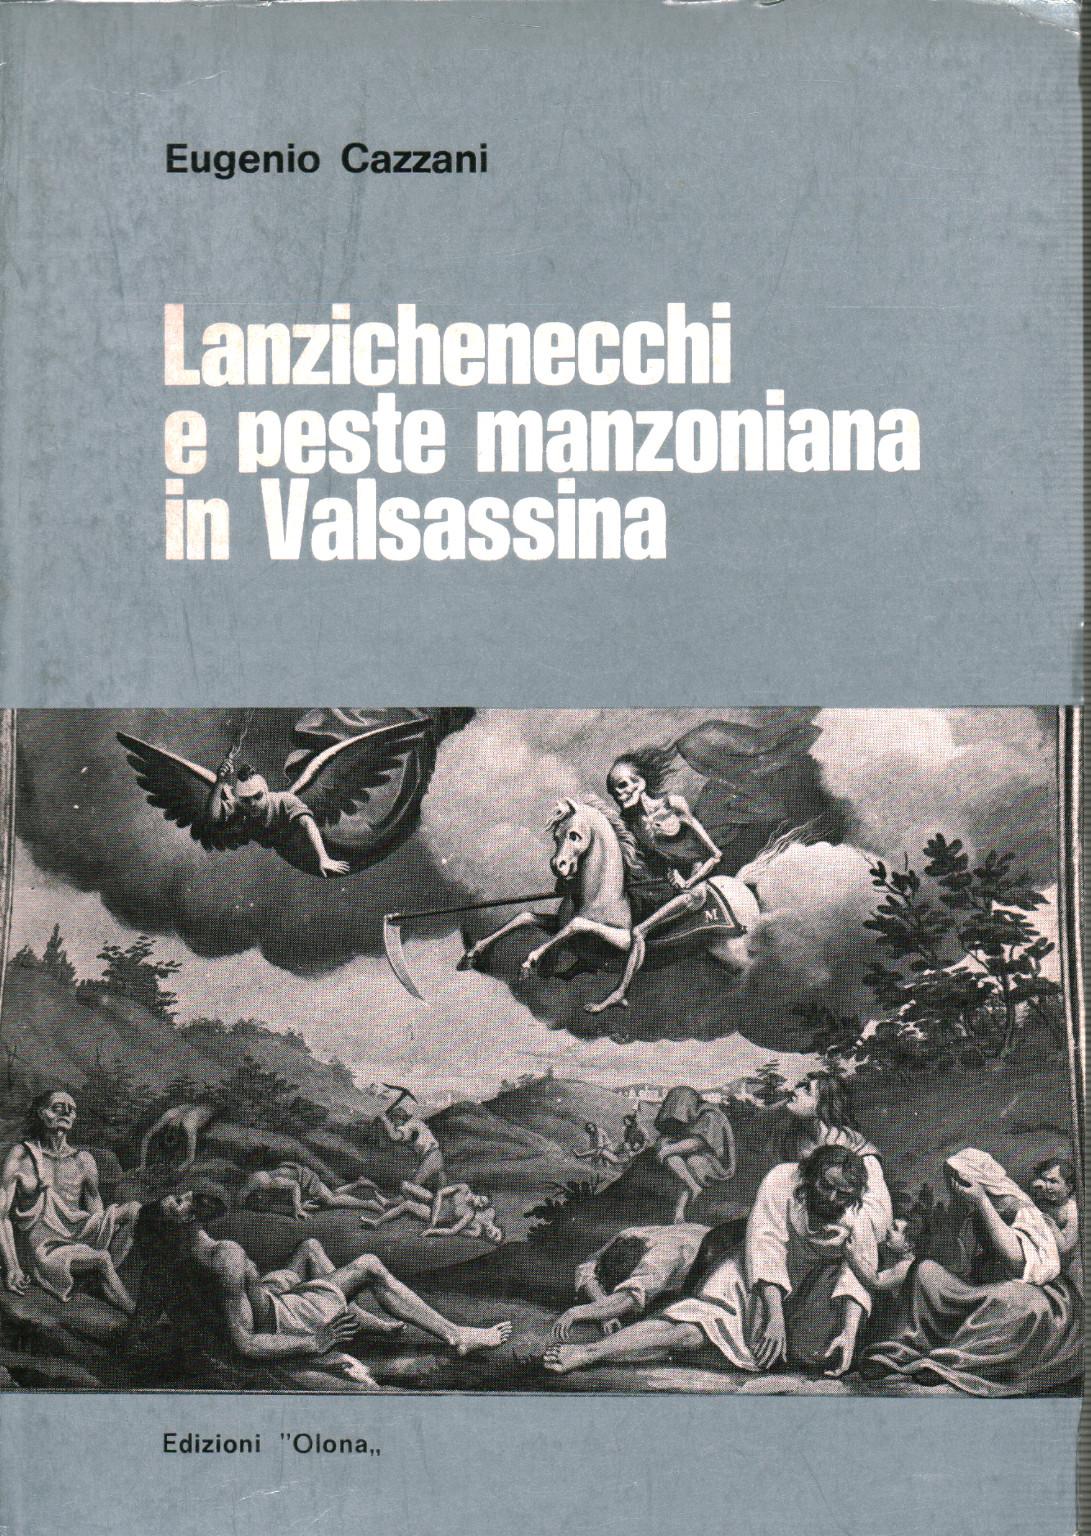 El lansquenets y la manzonian plaga en Valsassina, s.una.